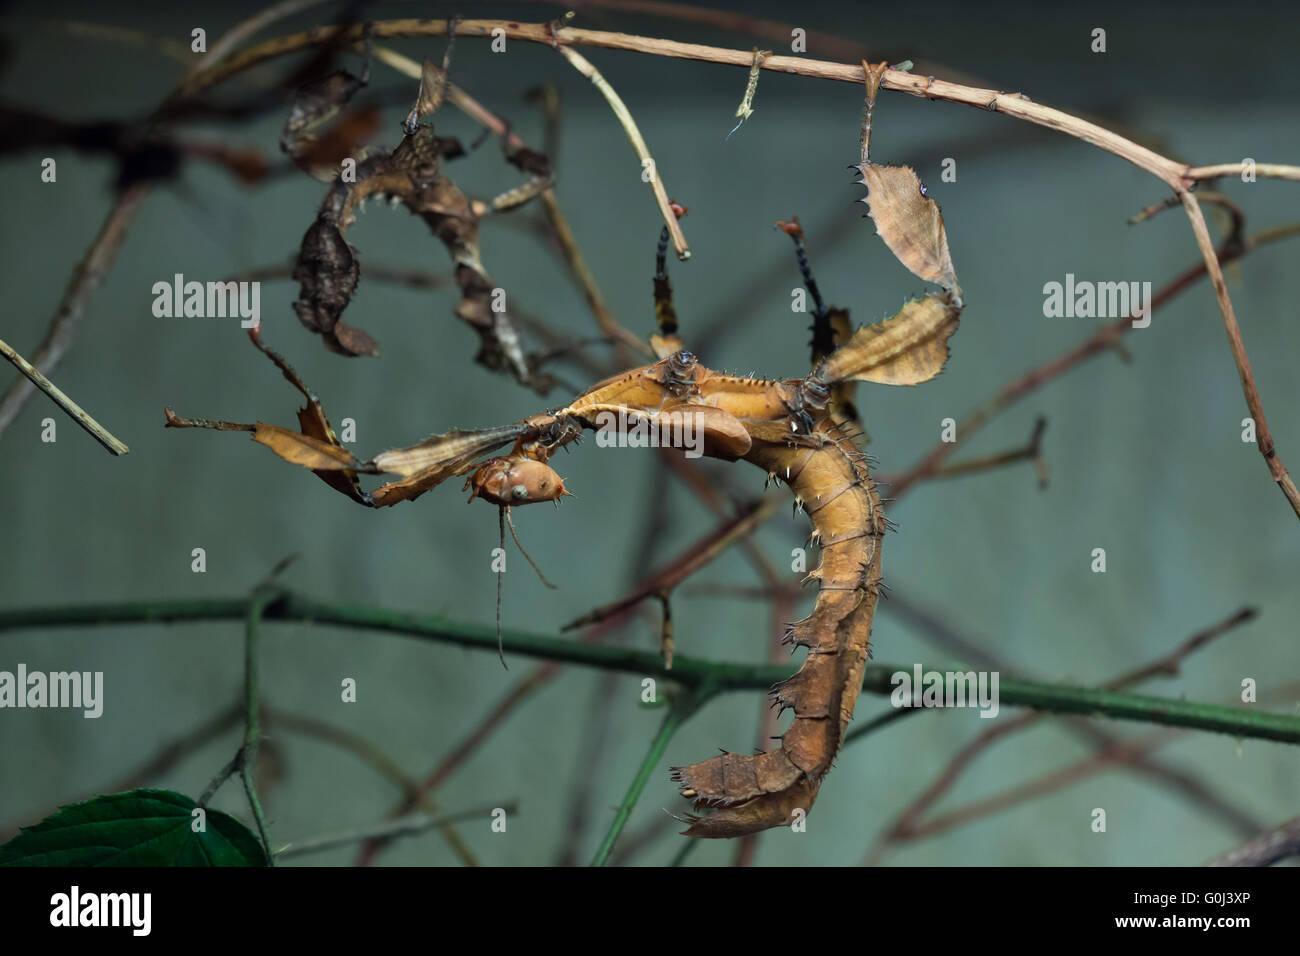 Australia caterpillar found giant xxx believe